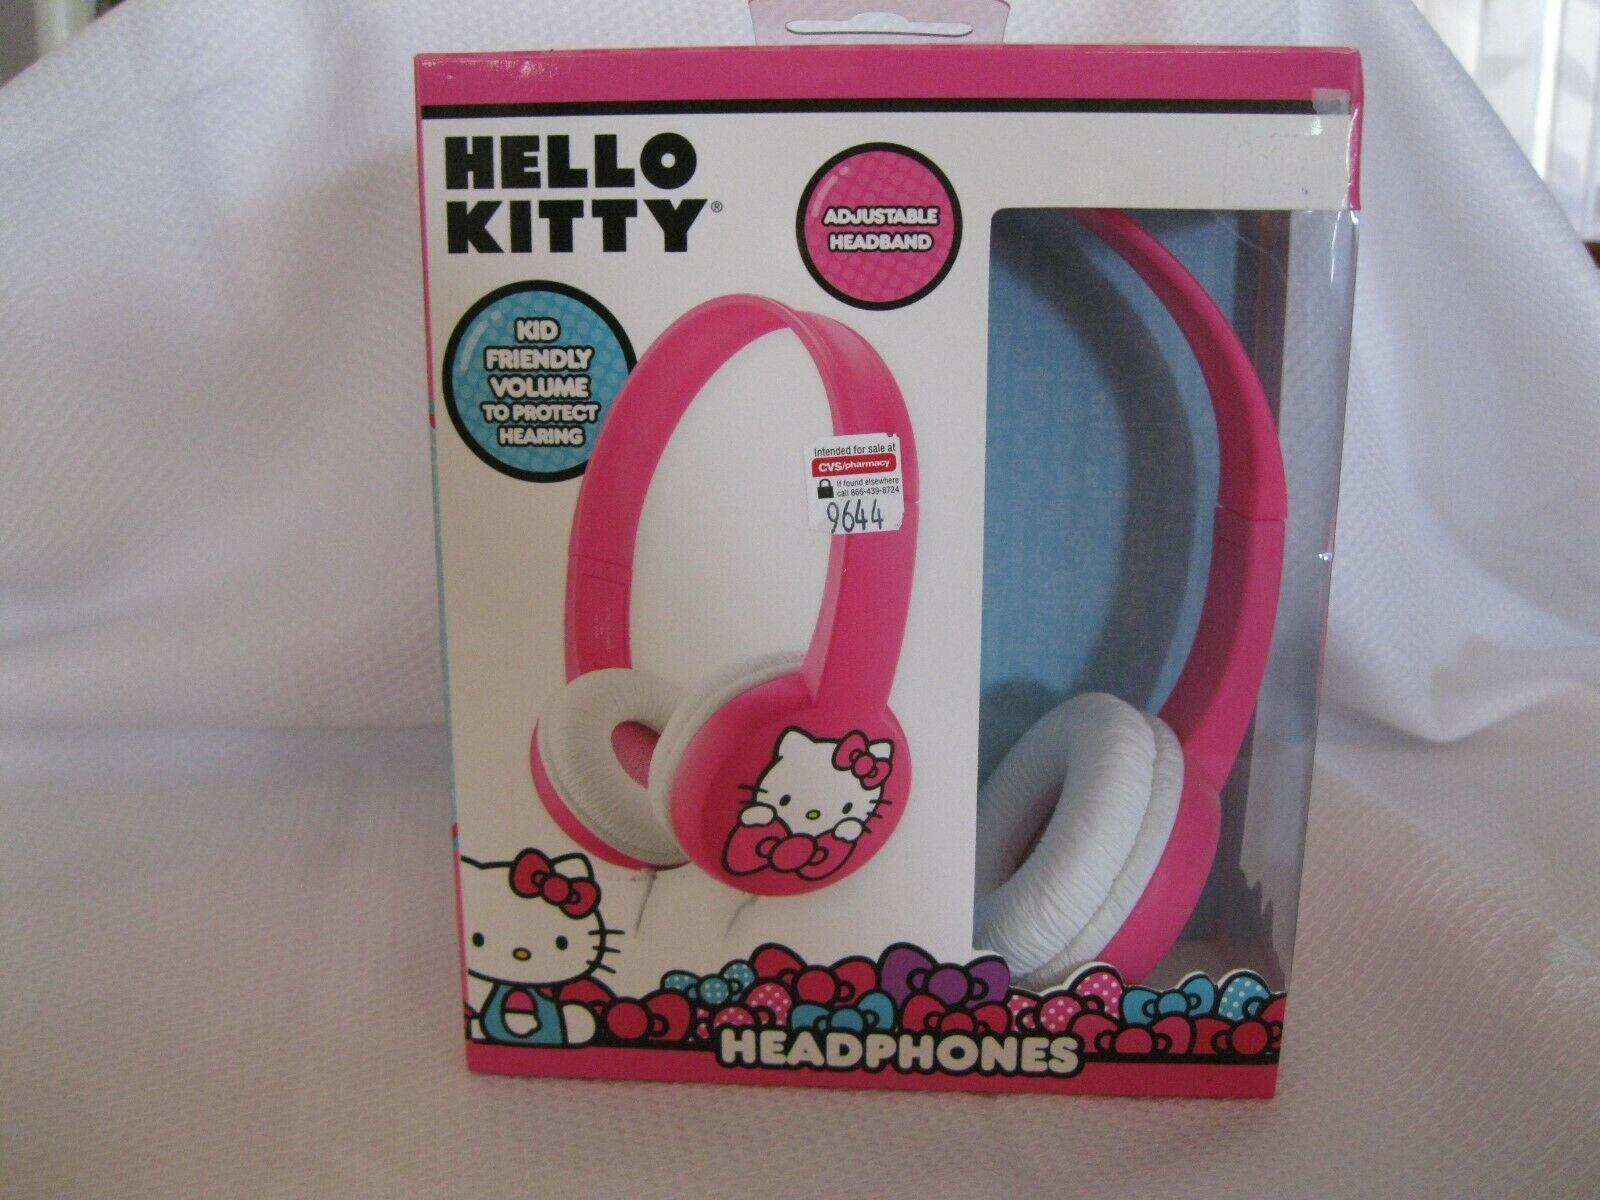 Hello Kitty By Sanrio Kid Friendly Wired Headphones With Adjustable Headband New Hello Kitty Headphones Wired Headphones